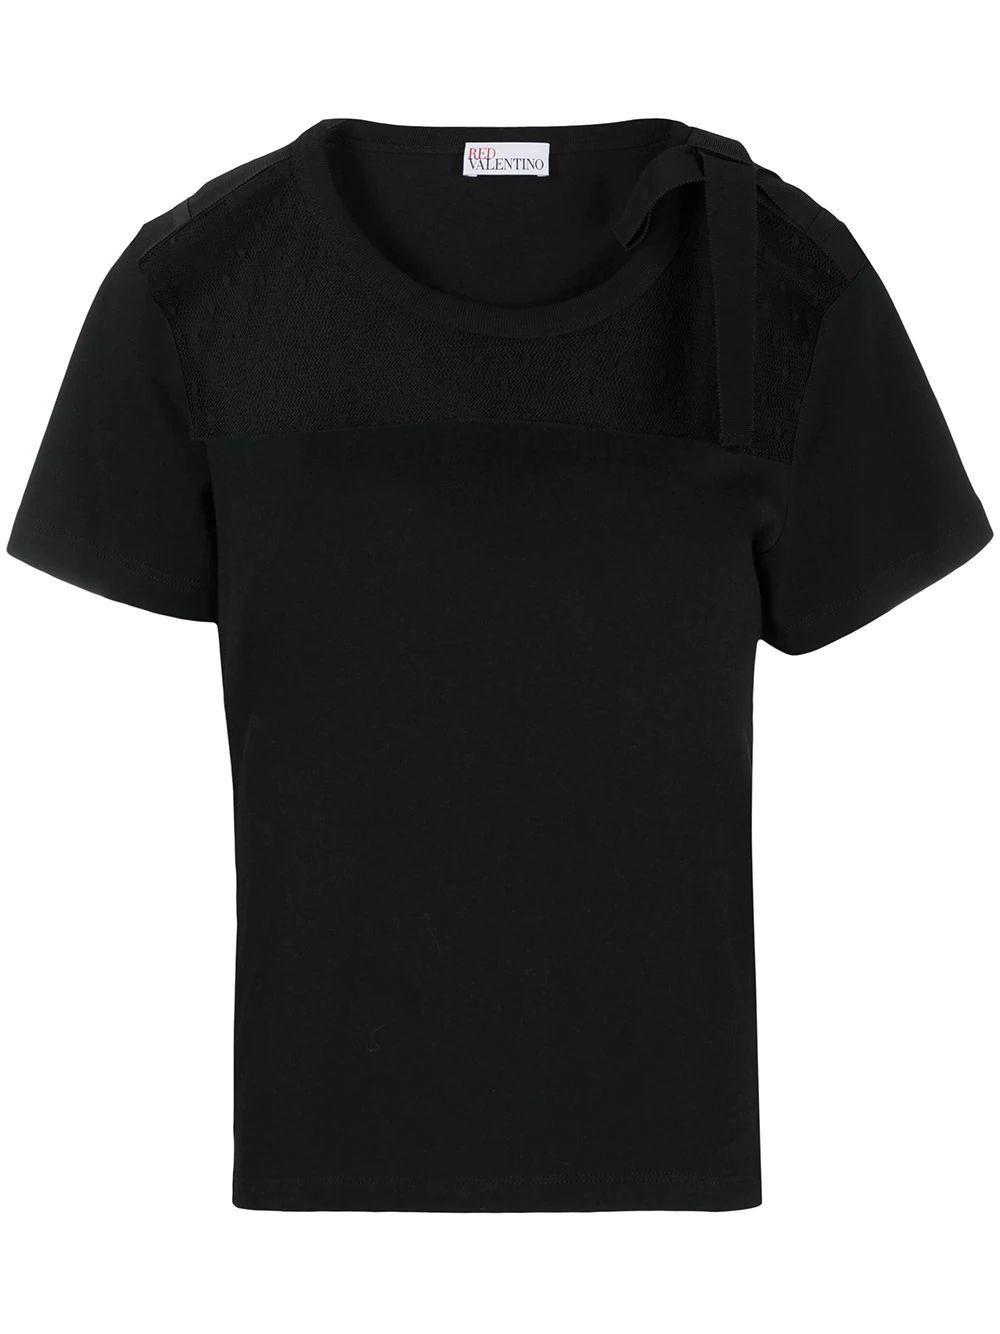 Swiss Dot Tulle- Panel T- Shirt Item # VR3MG08W5Q2